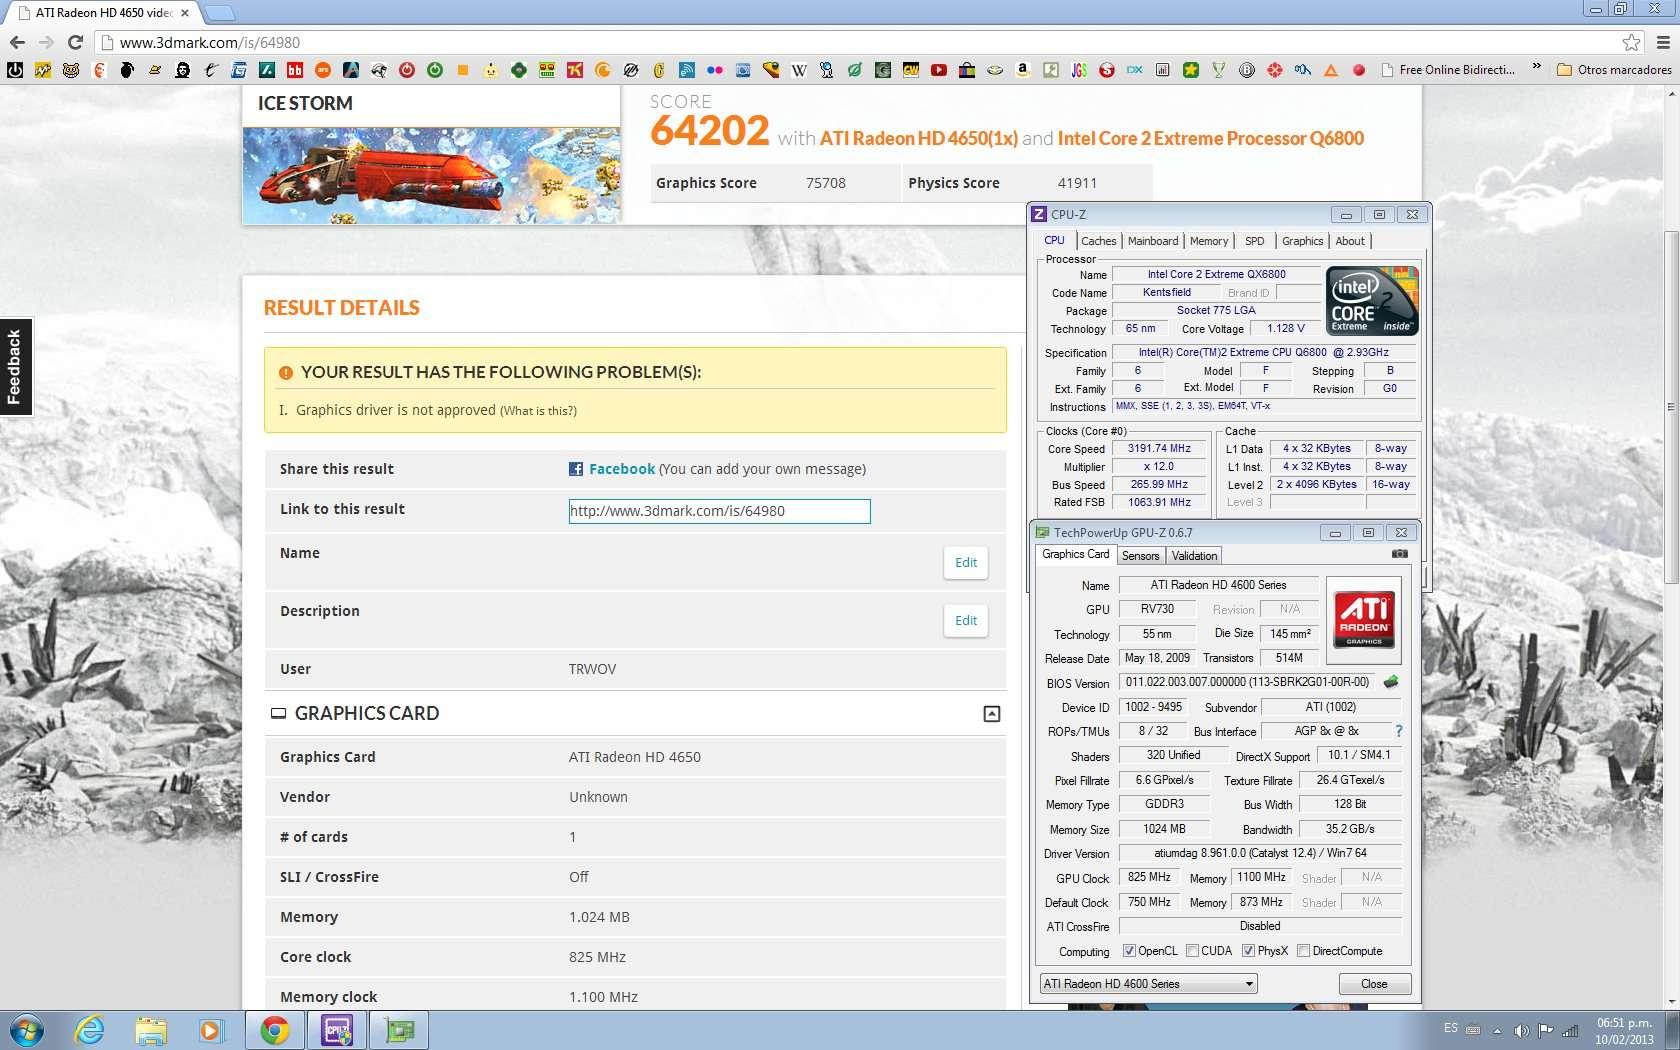 Realtek 8185 windows xp